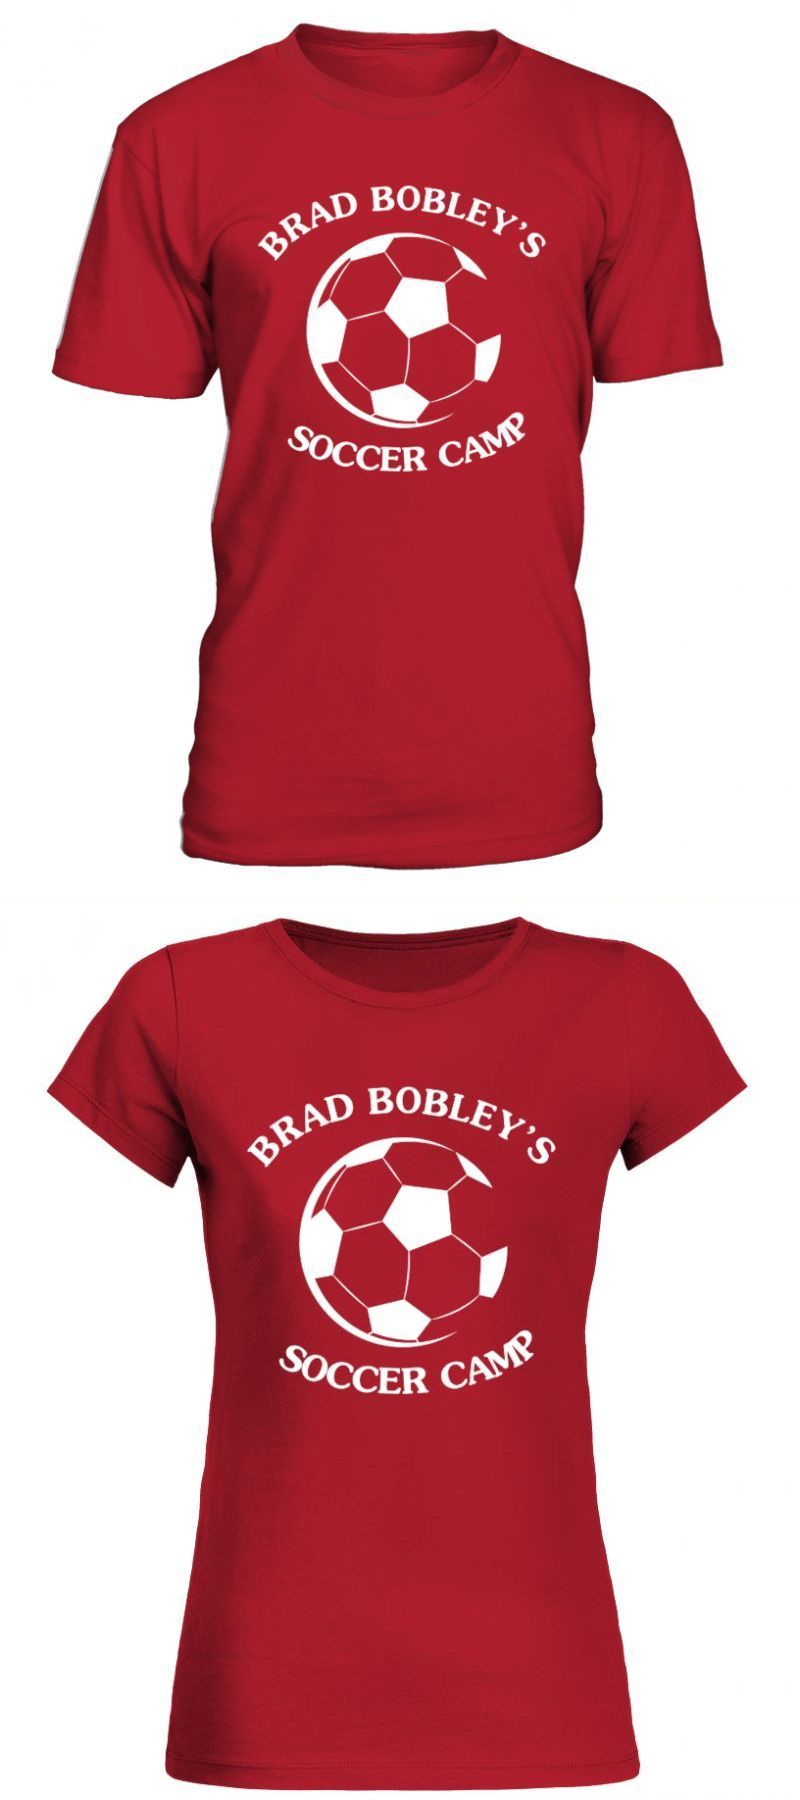 d52826e24 Youth football t shirt designs soccer camp - name customized tiger football t  shirt designs  youth  football  shirt  designs  soccer  camp  name   customized ...